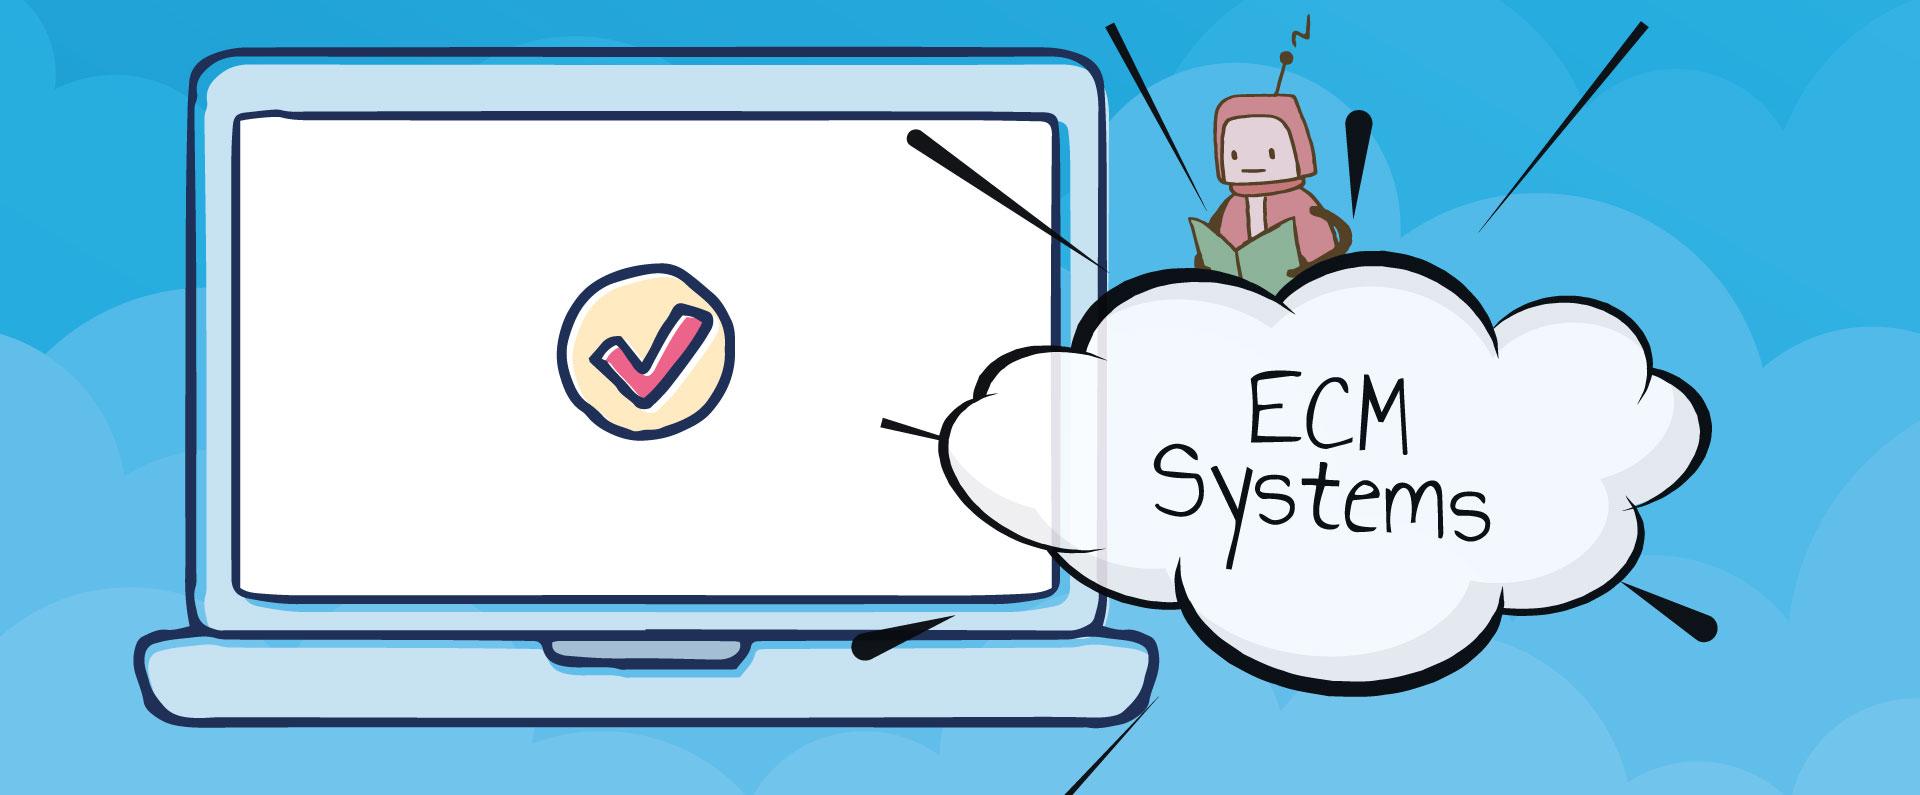 The real benefits of an Enterprise Content Management (ECM) system